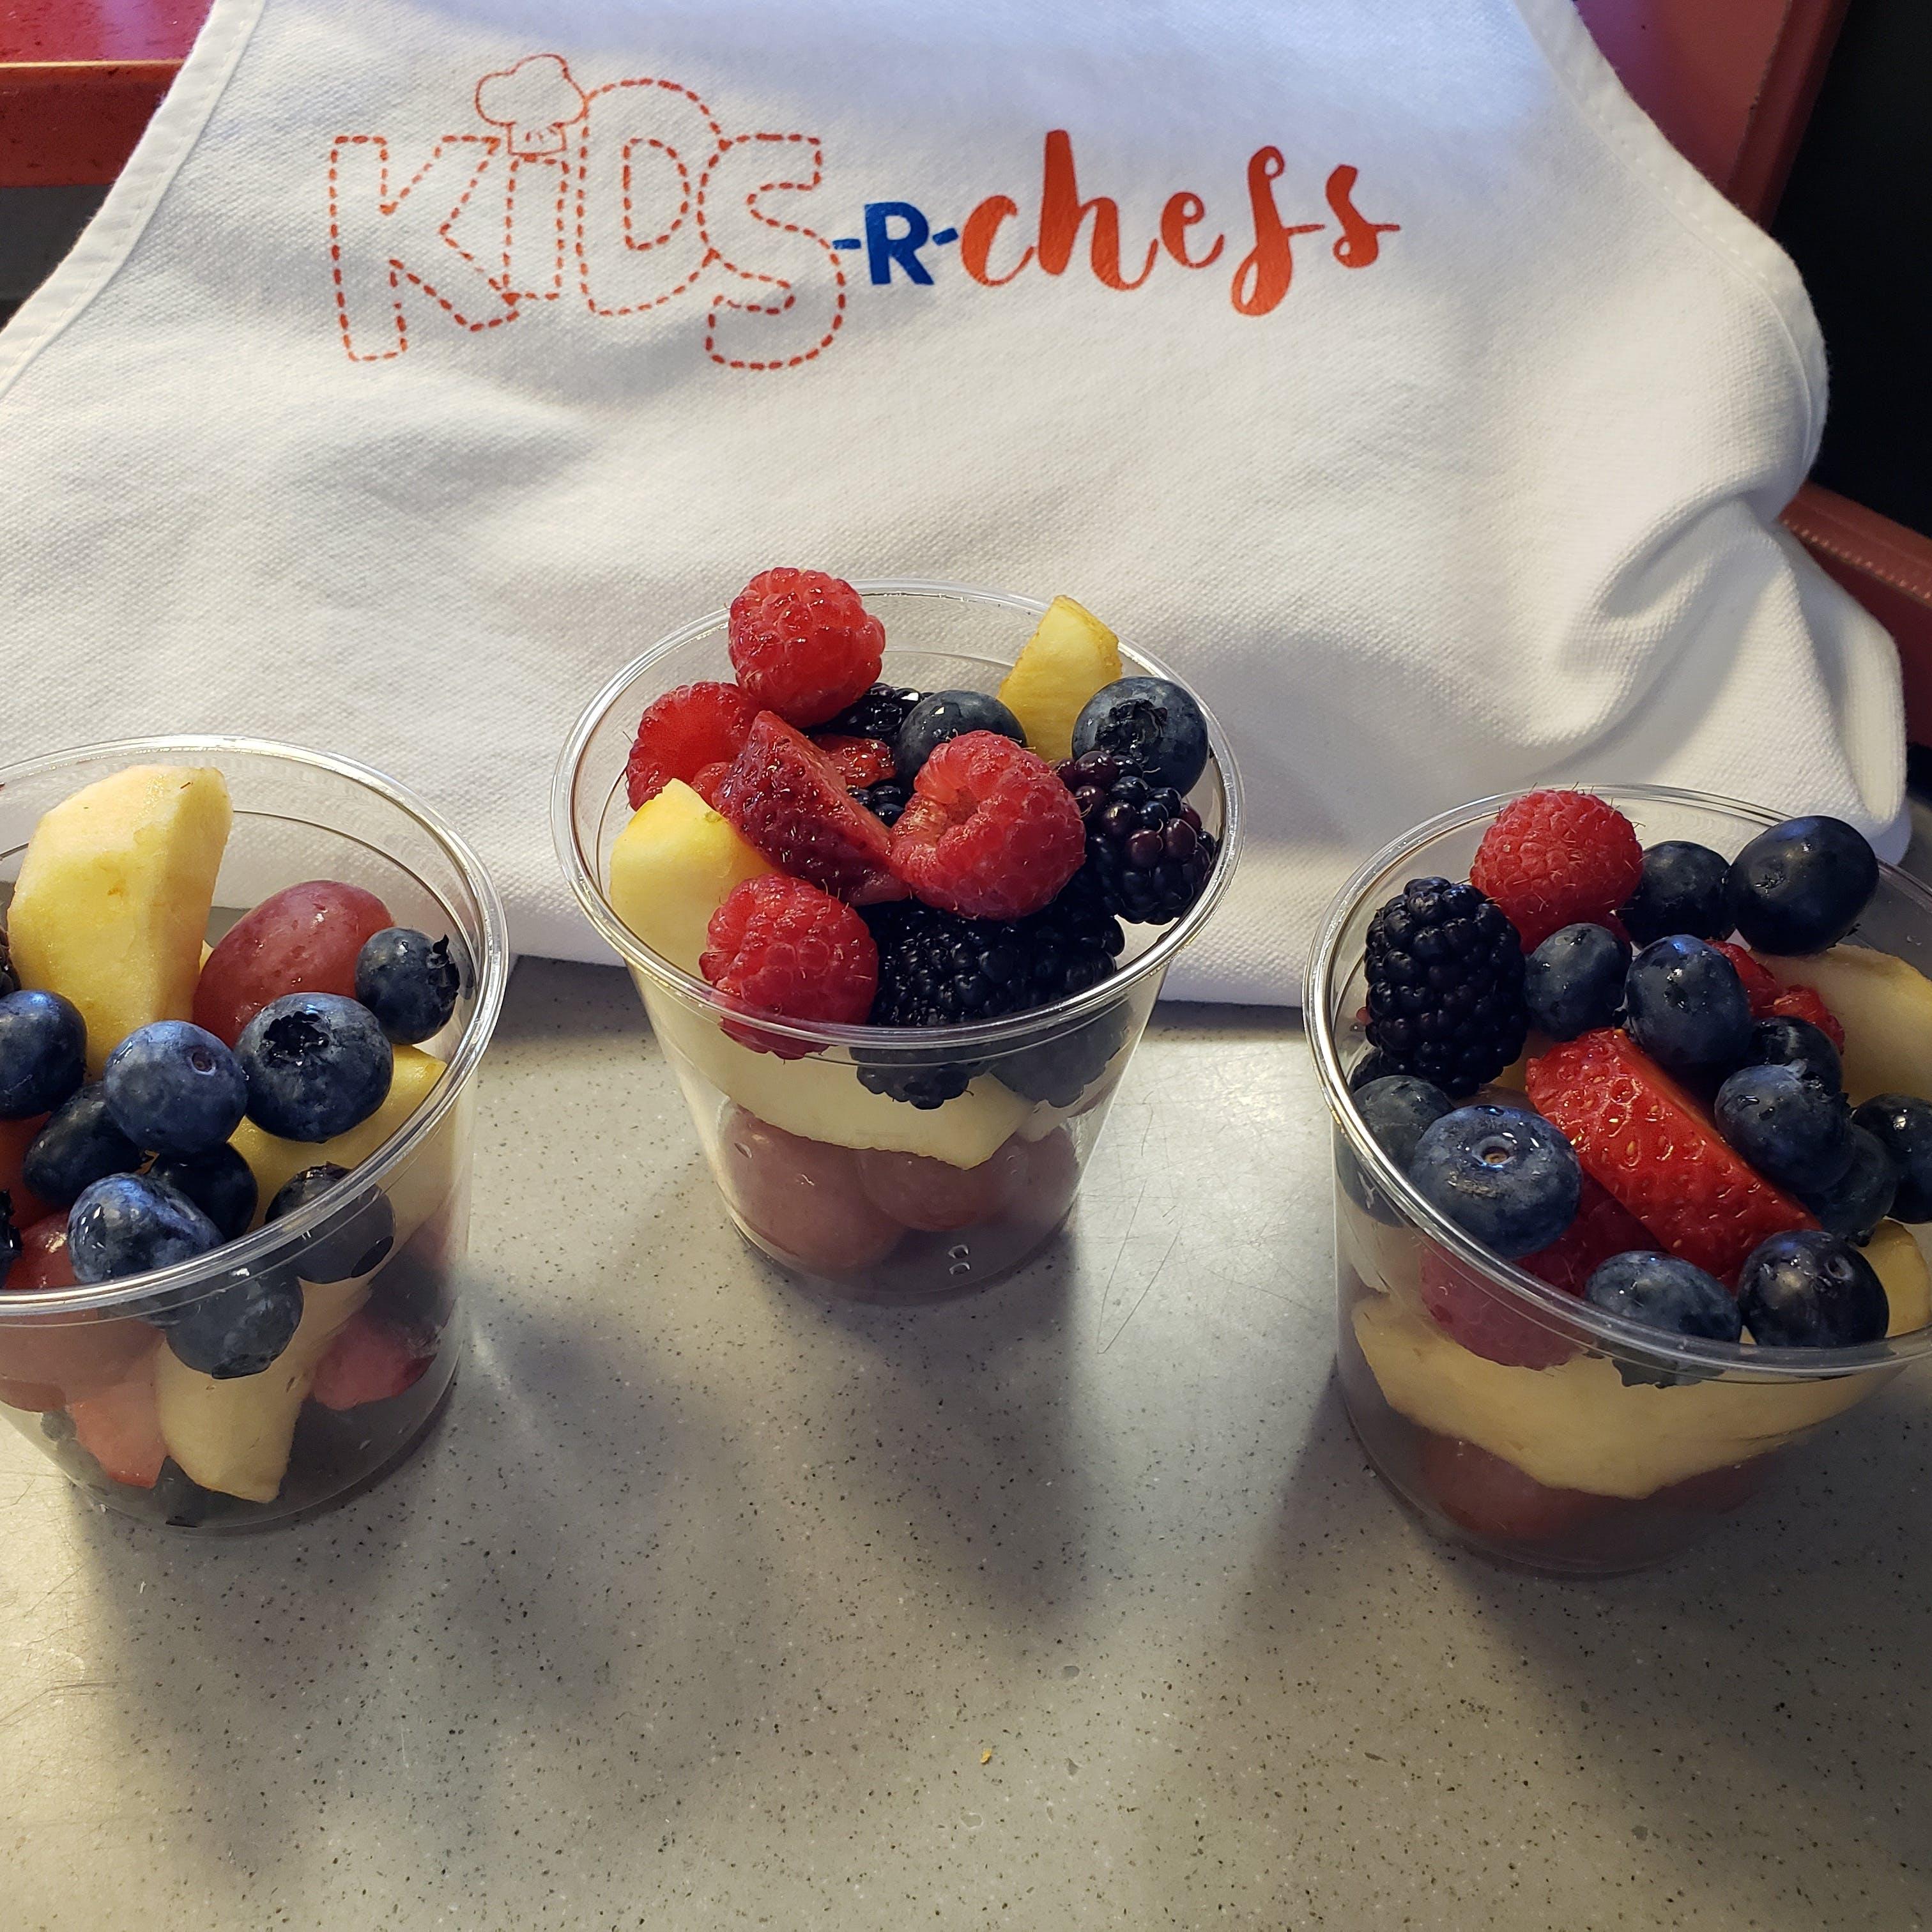 Free stock photo of berries, bowl of fruit, eating healthy, fresh fruit